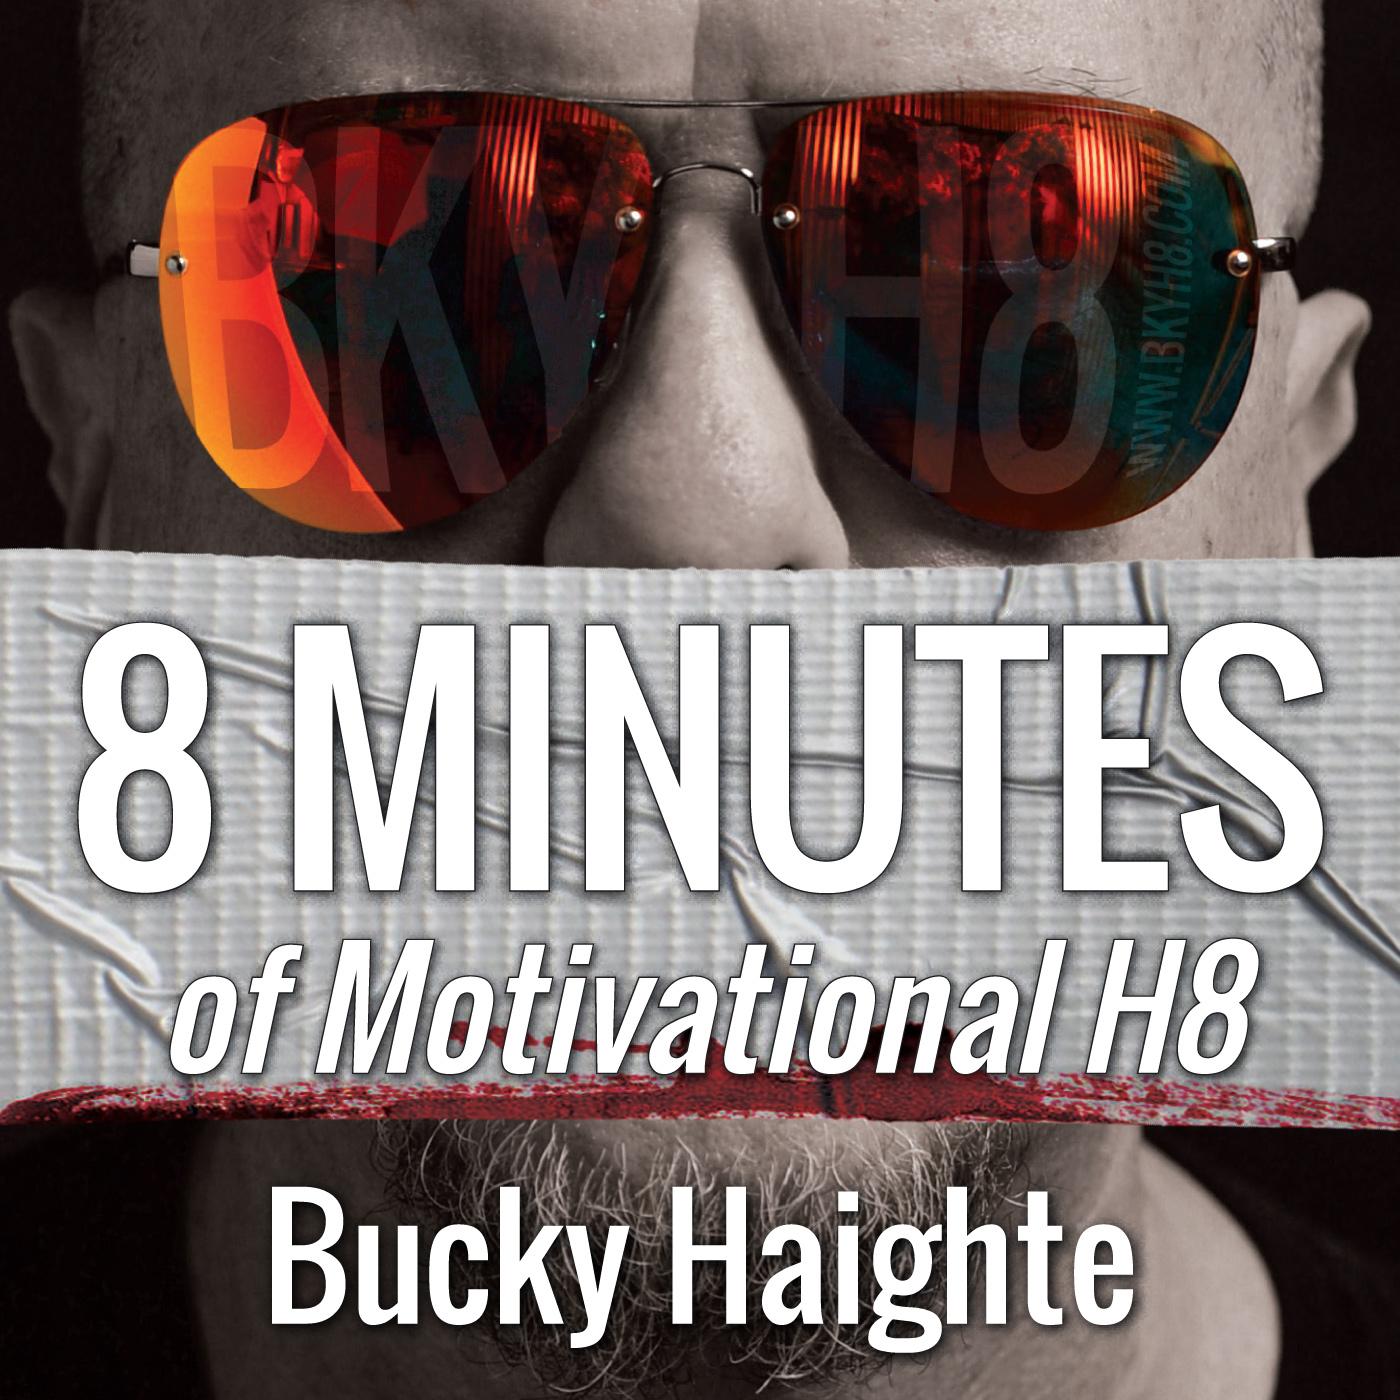 8 Minutes of Motivational H8 show art